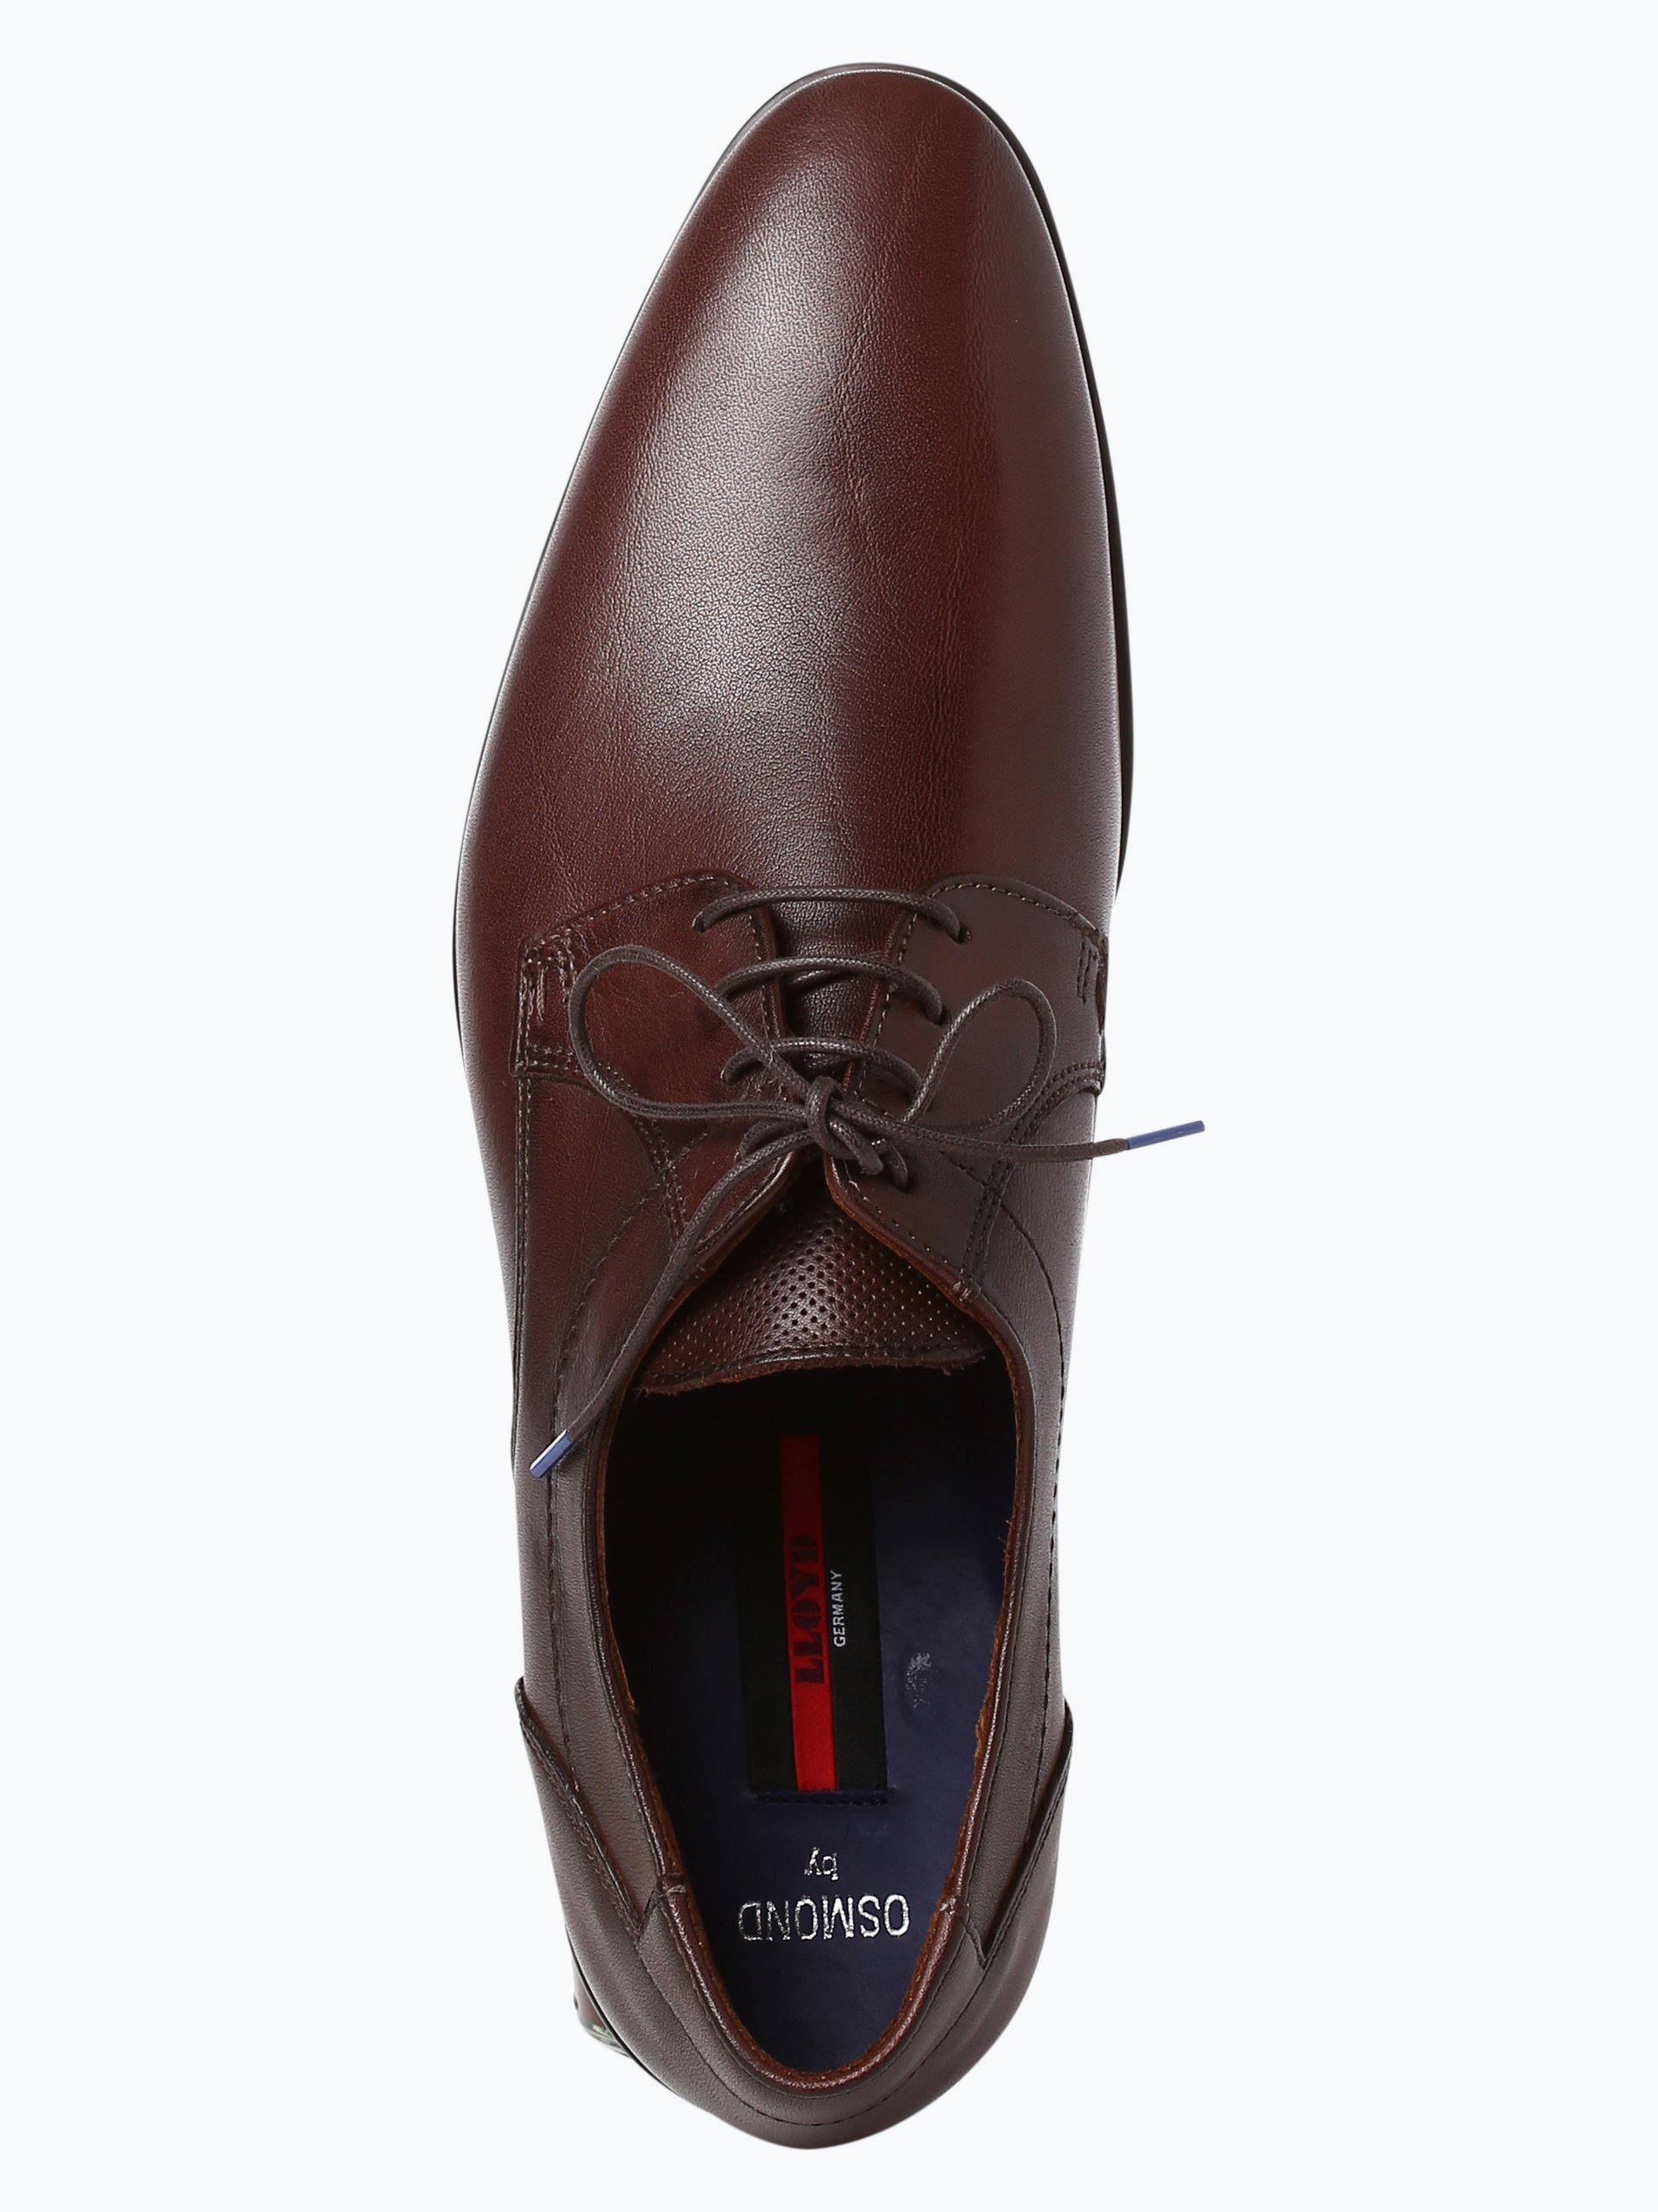 Lloyd Herren Schnürschuhe aus Leder - Osmond